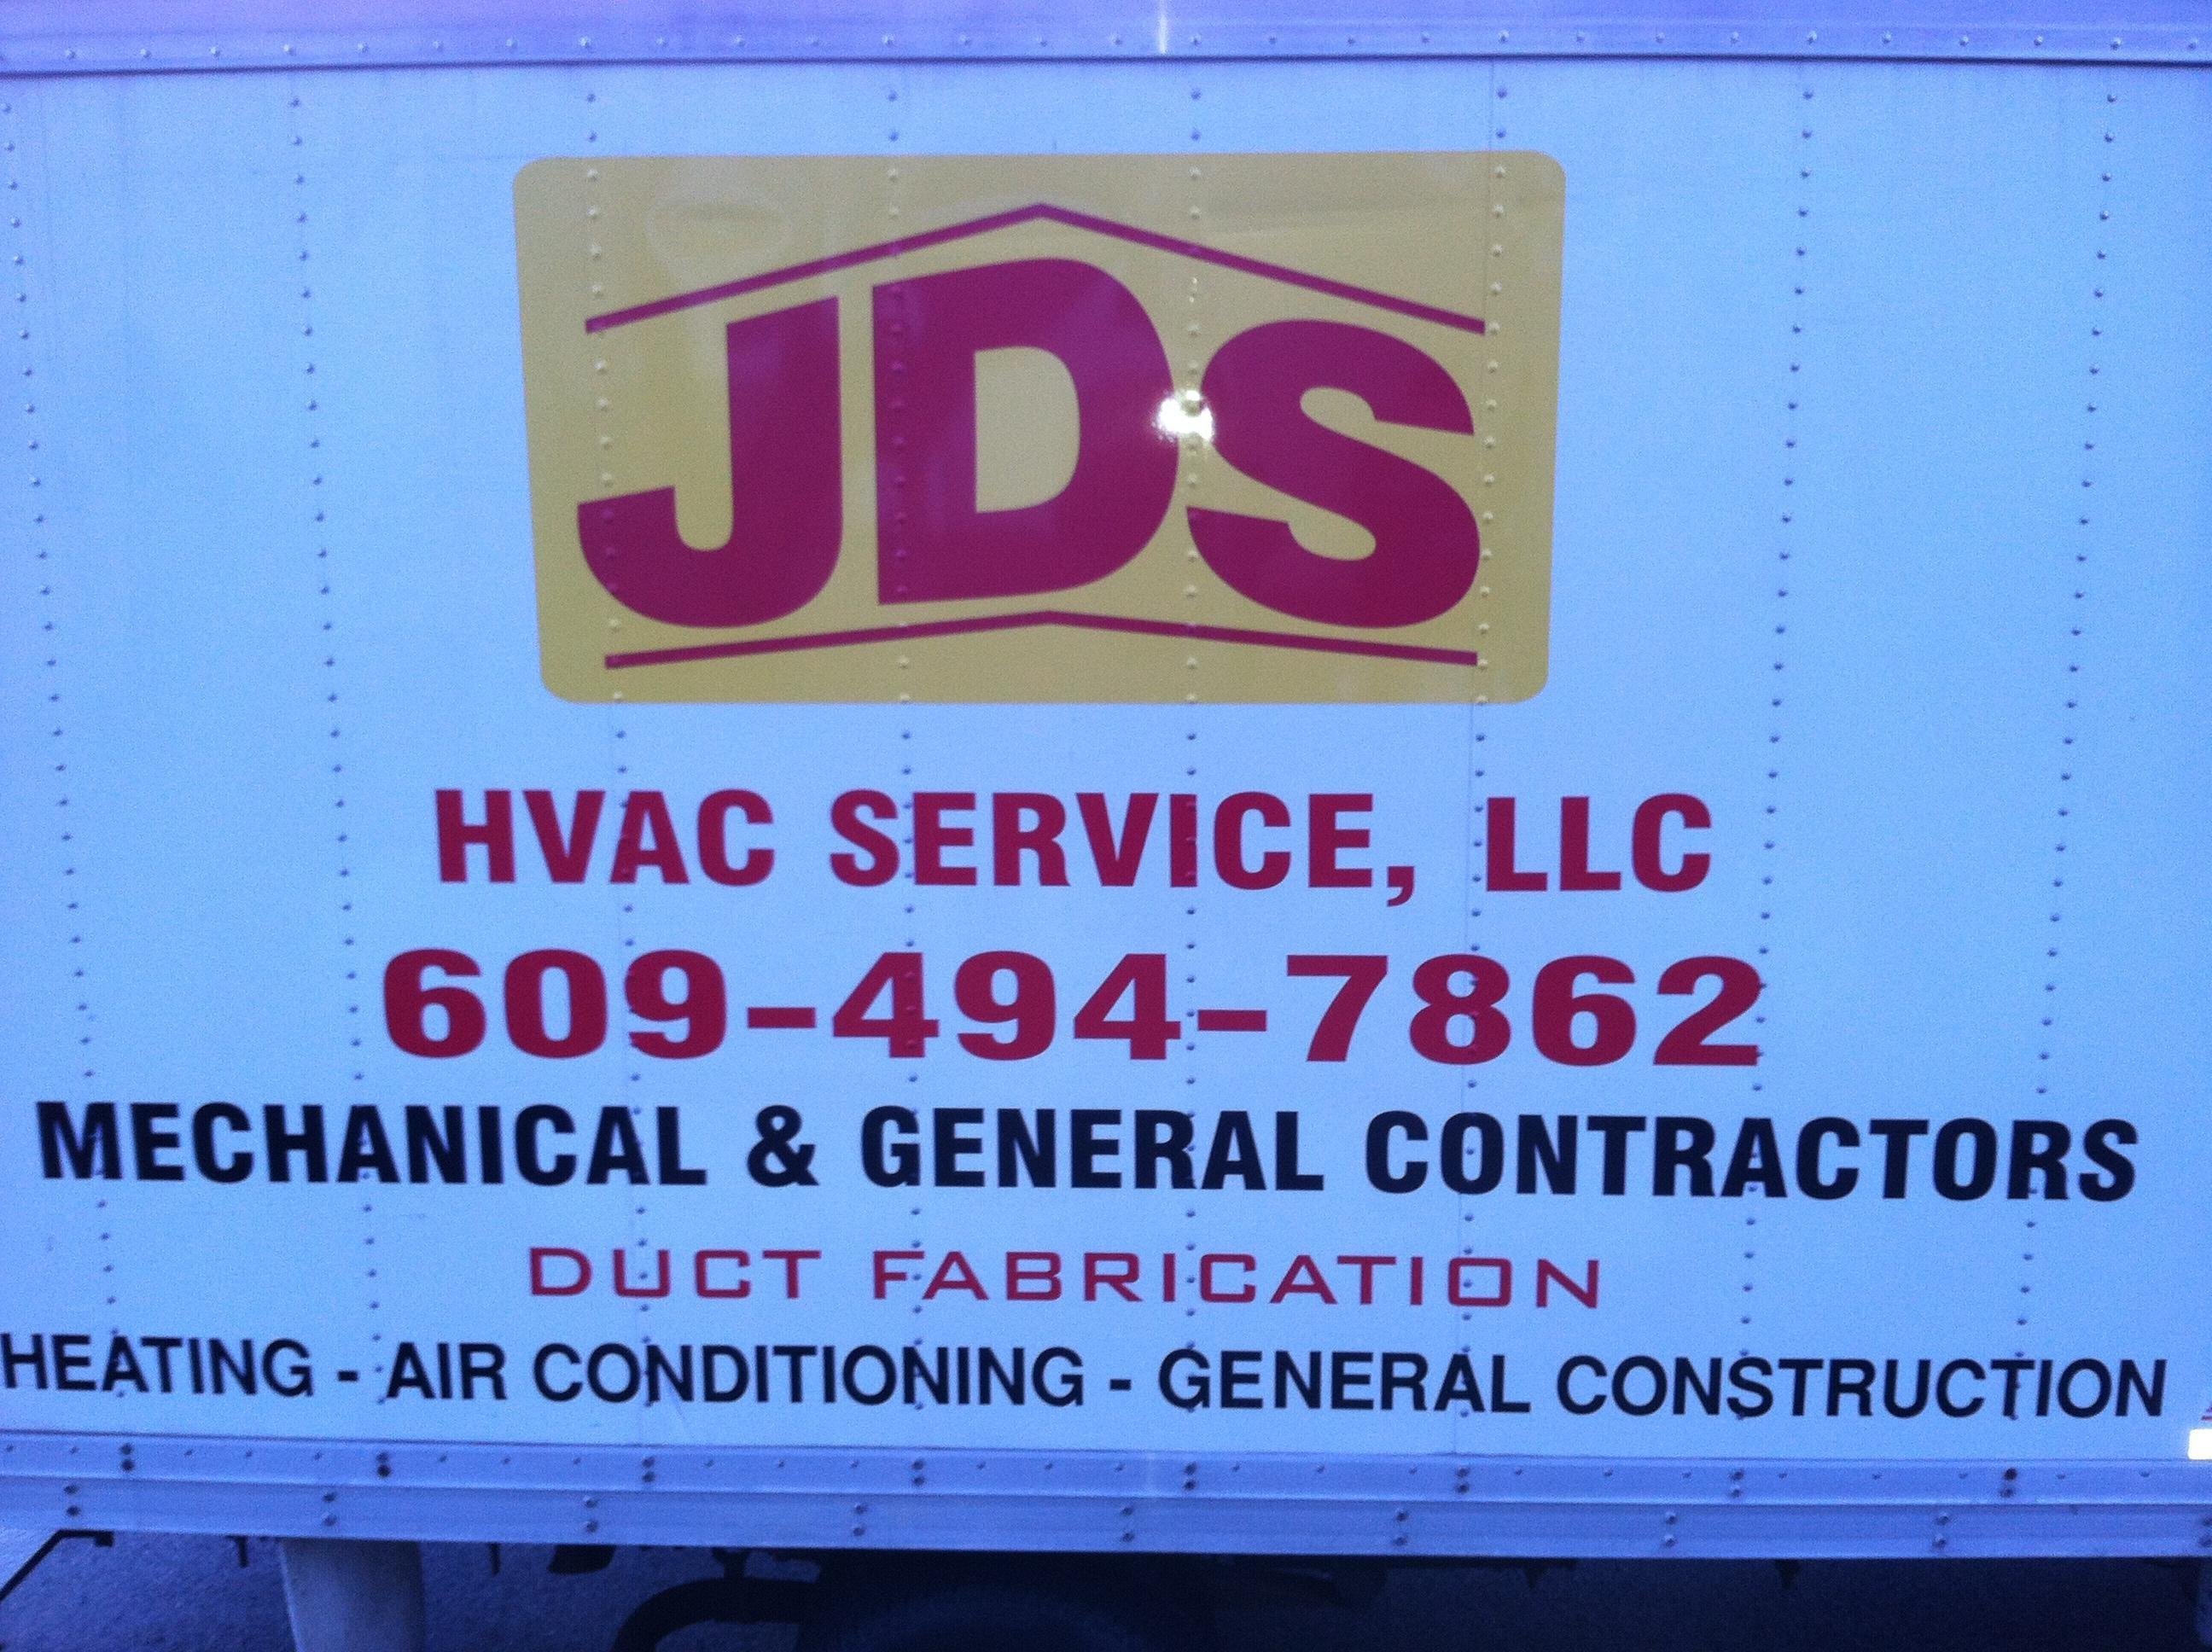 JDS HVAC Service llc